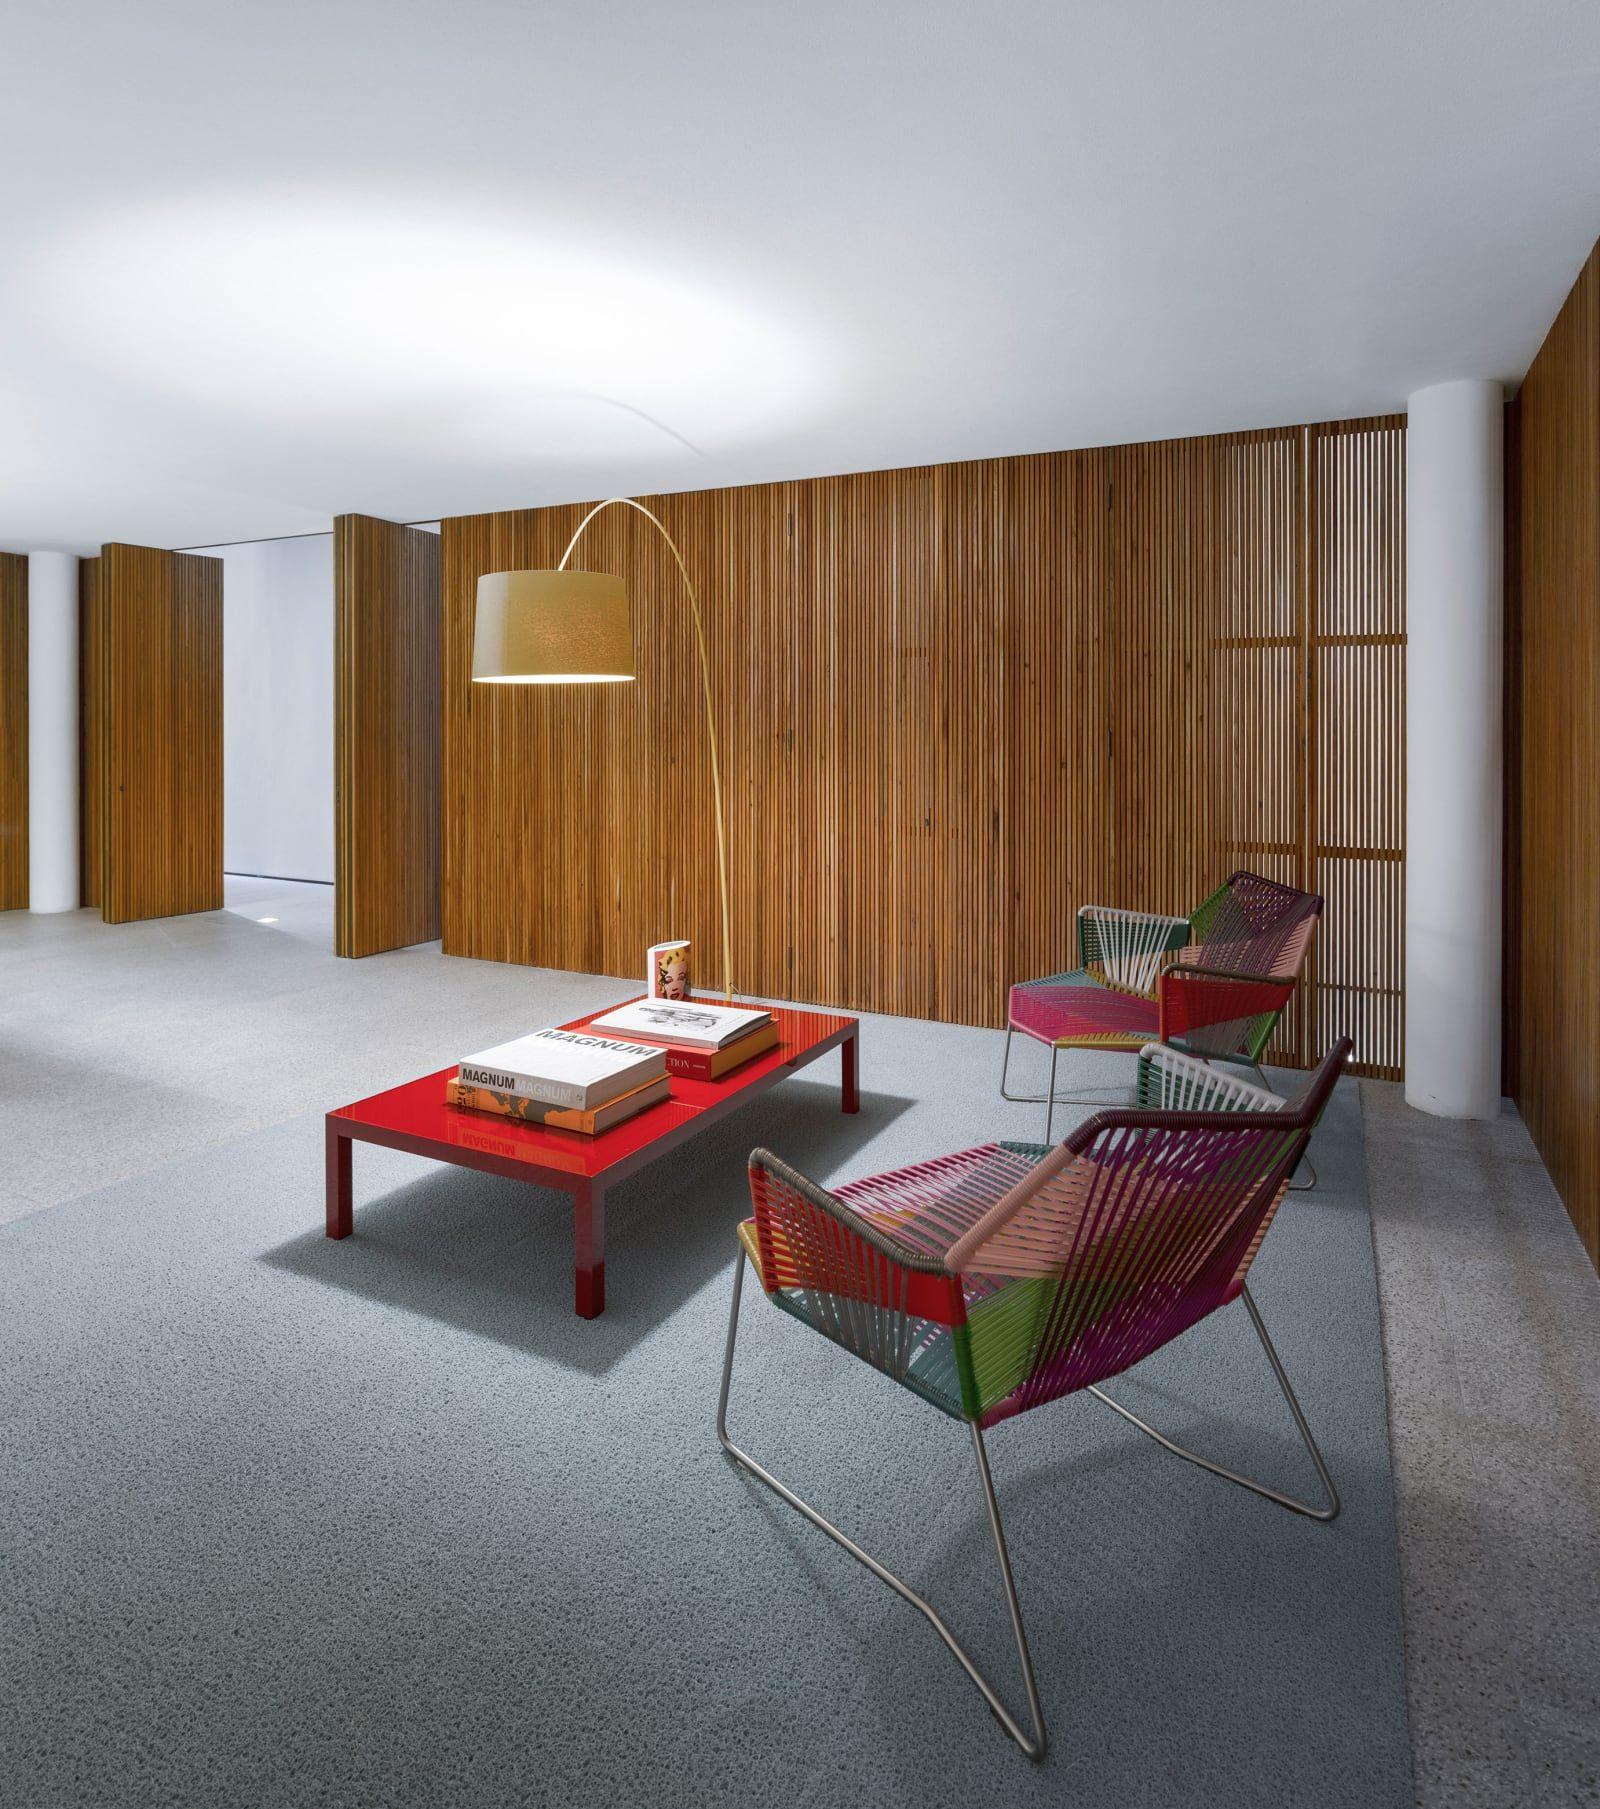 kogan furniture. Studio Mk27 - Marcio Kogan, Fernando Guerra / FG+SG · SC Contemporary ArchitectureFurniture Kogan Furniture